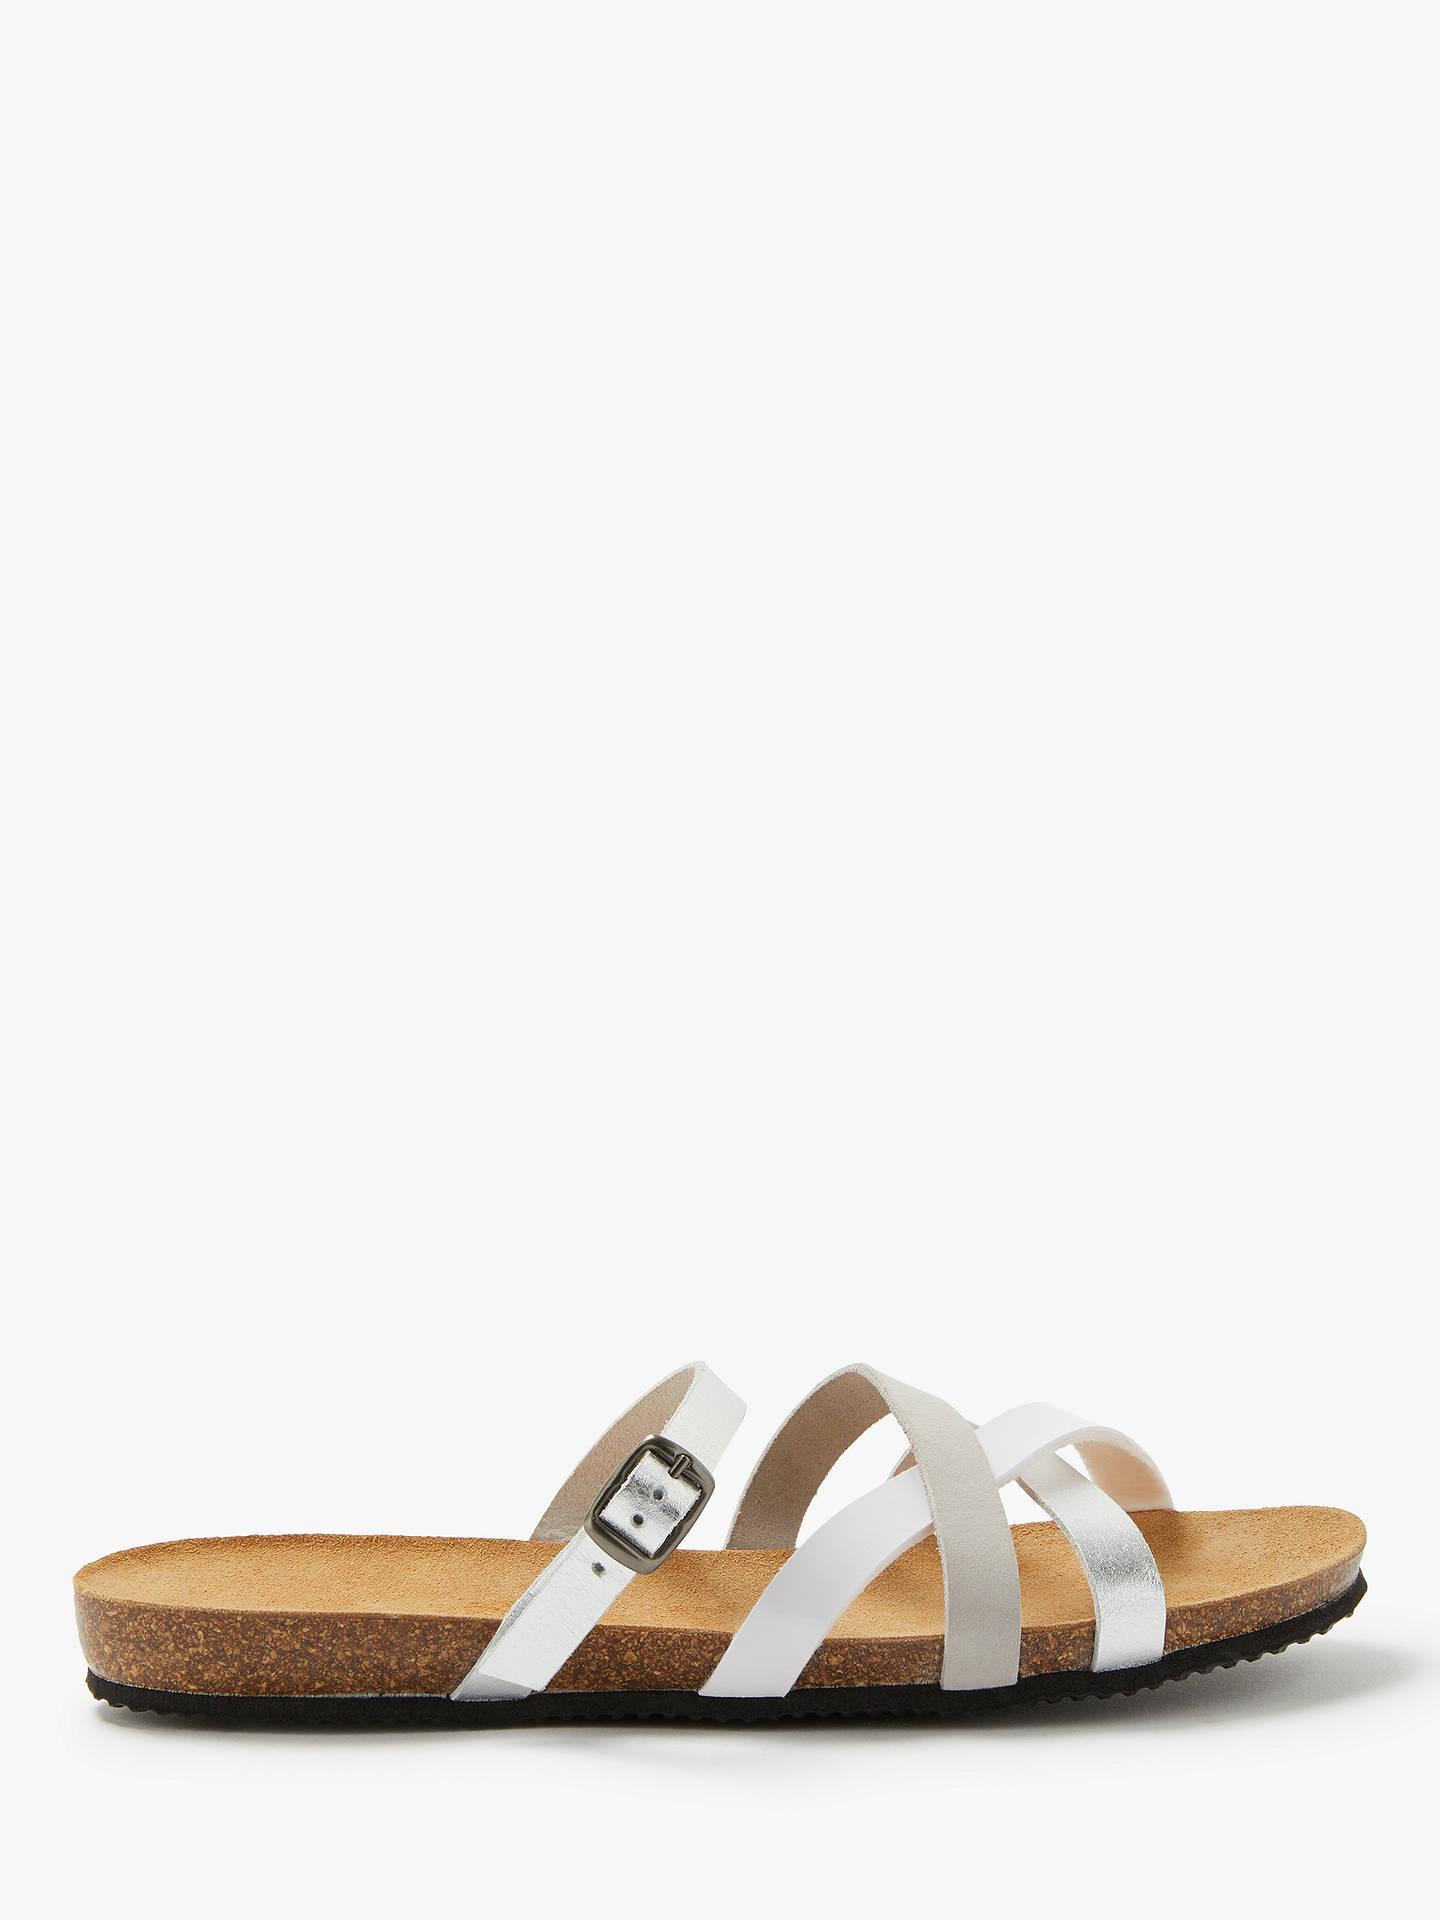 1480c761c72e John Lewis   Partners Lois Open Toe Flat Sandals at John Lewis ...